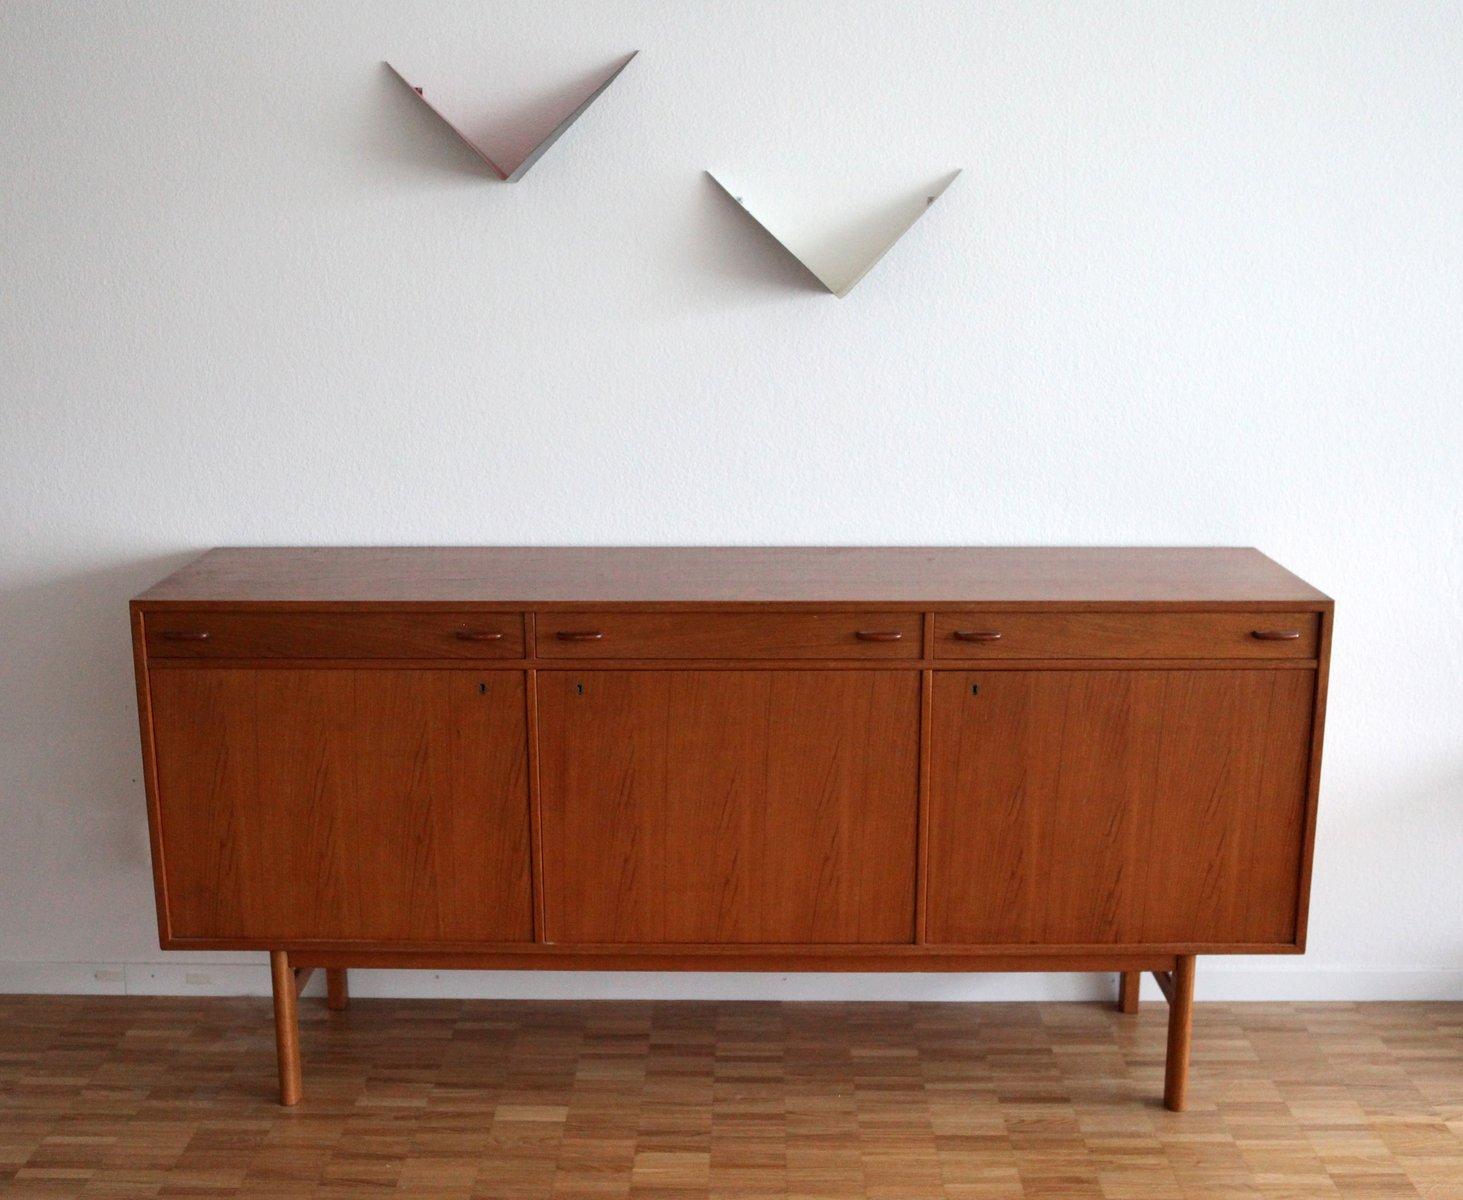 Danish Mid Century Modern Teak Sideboard for sale at Pamono